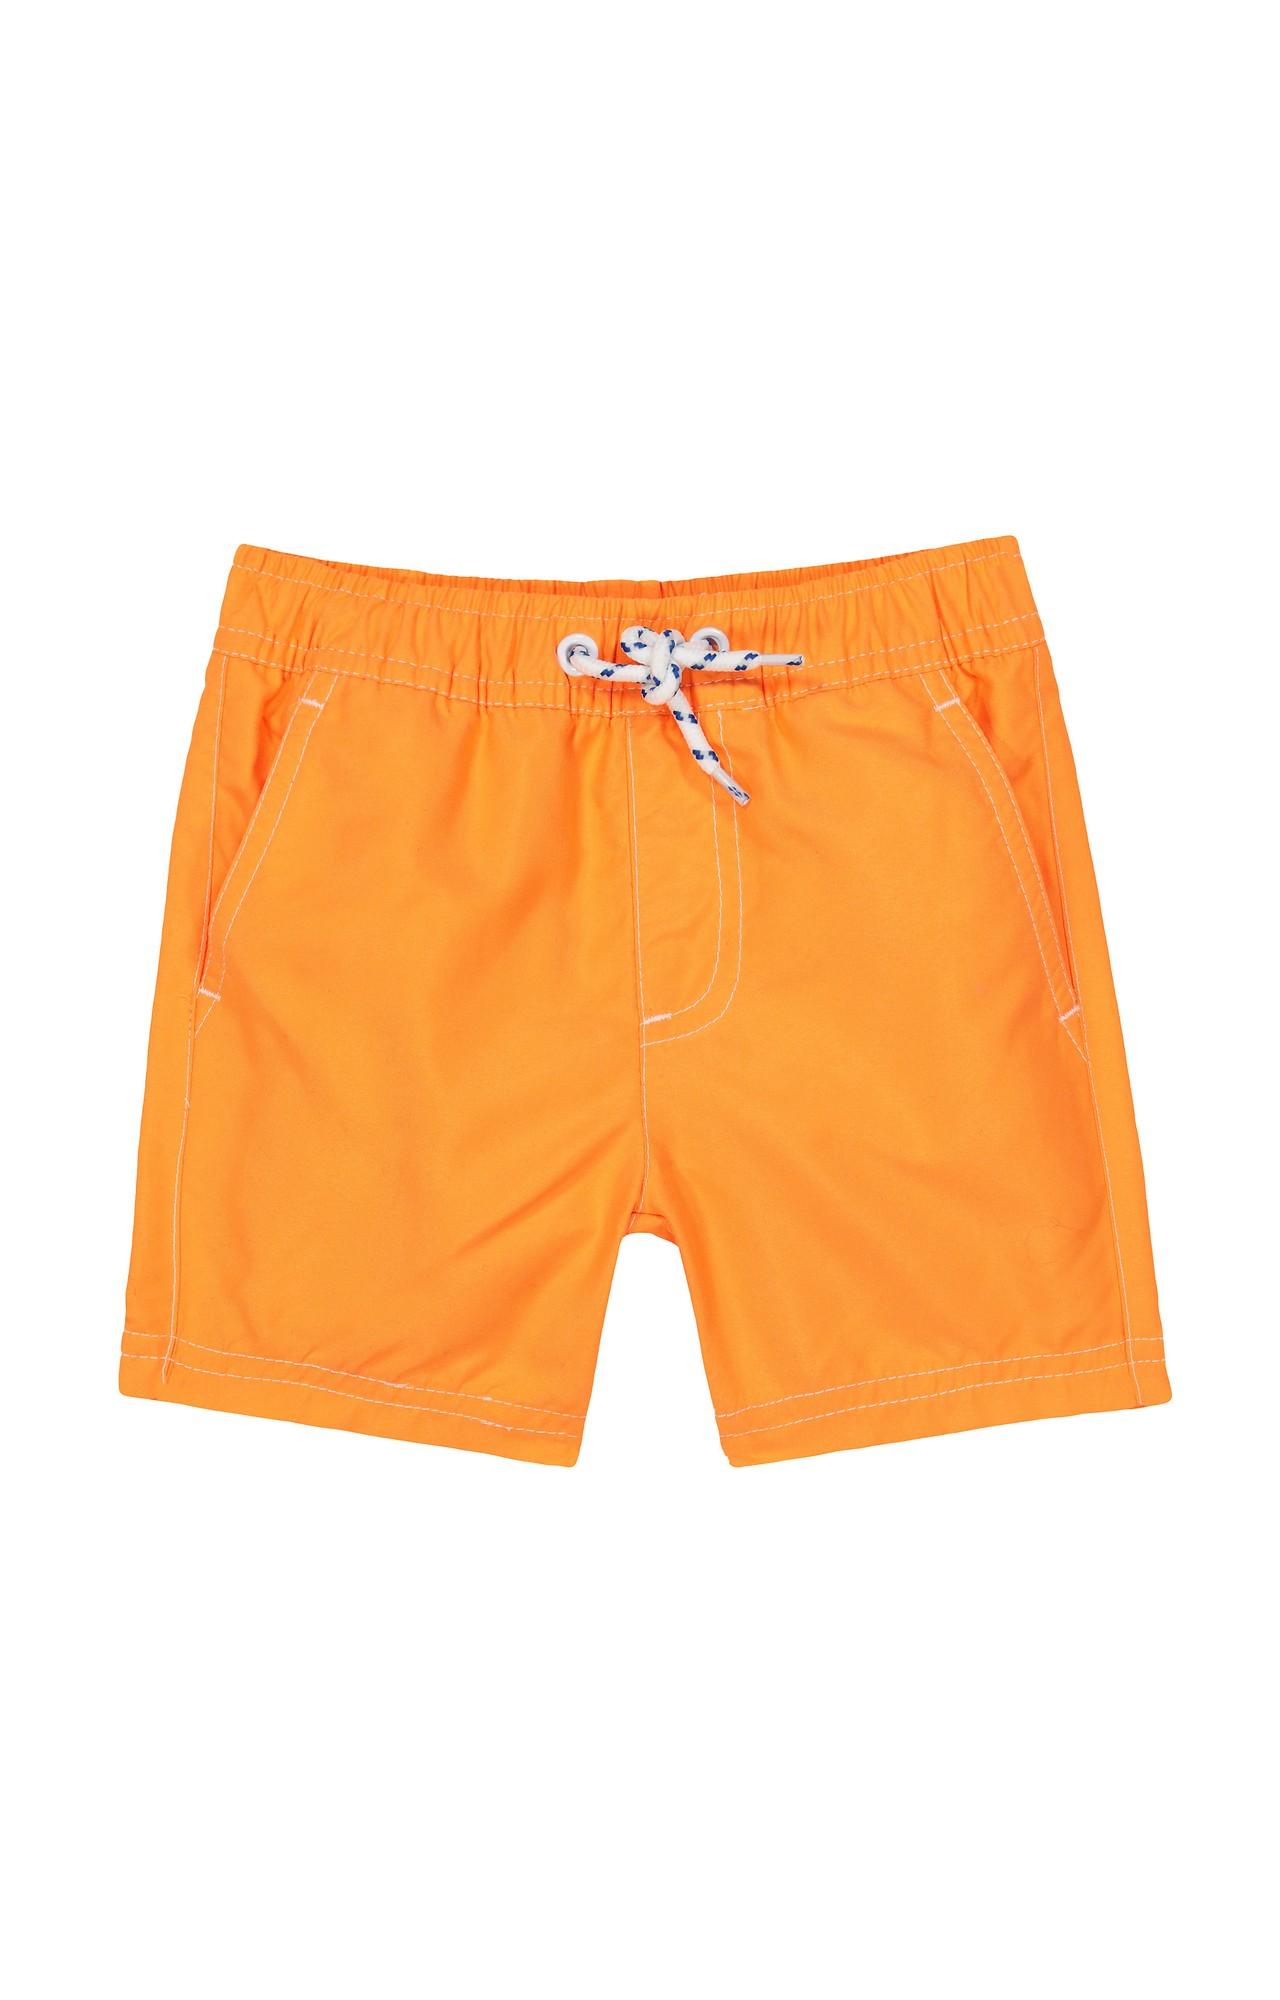 Mothercare | Orange Solid Beachwear Bottoms